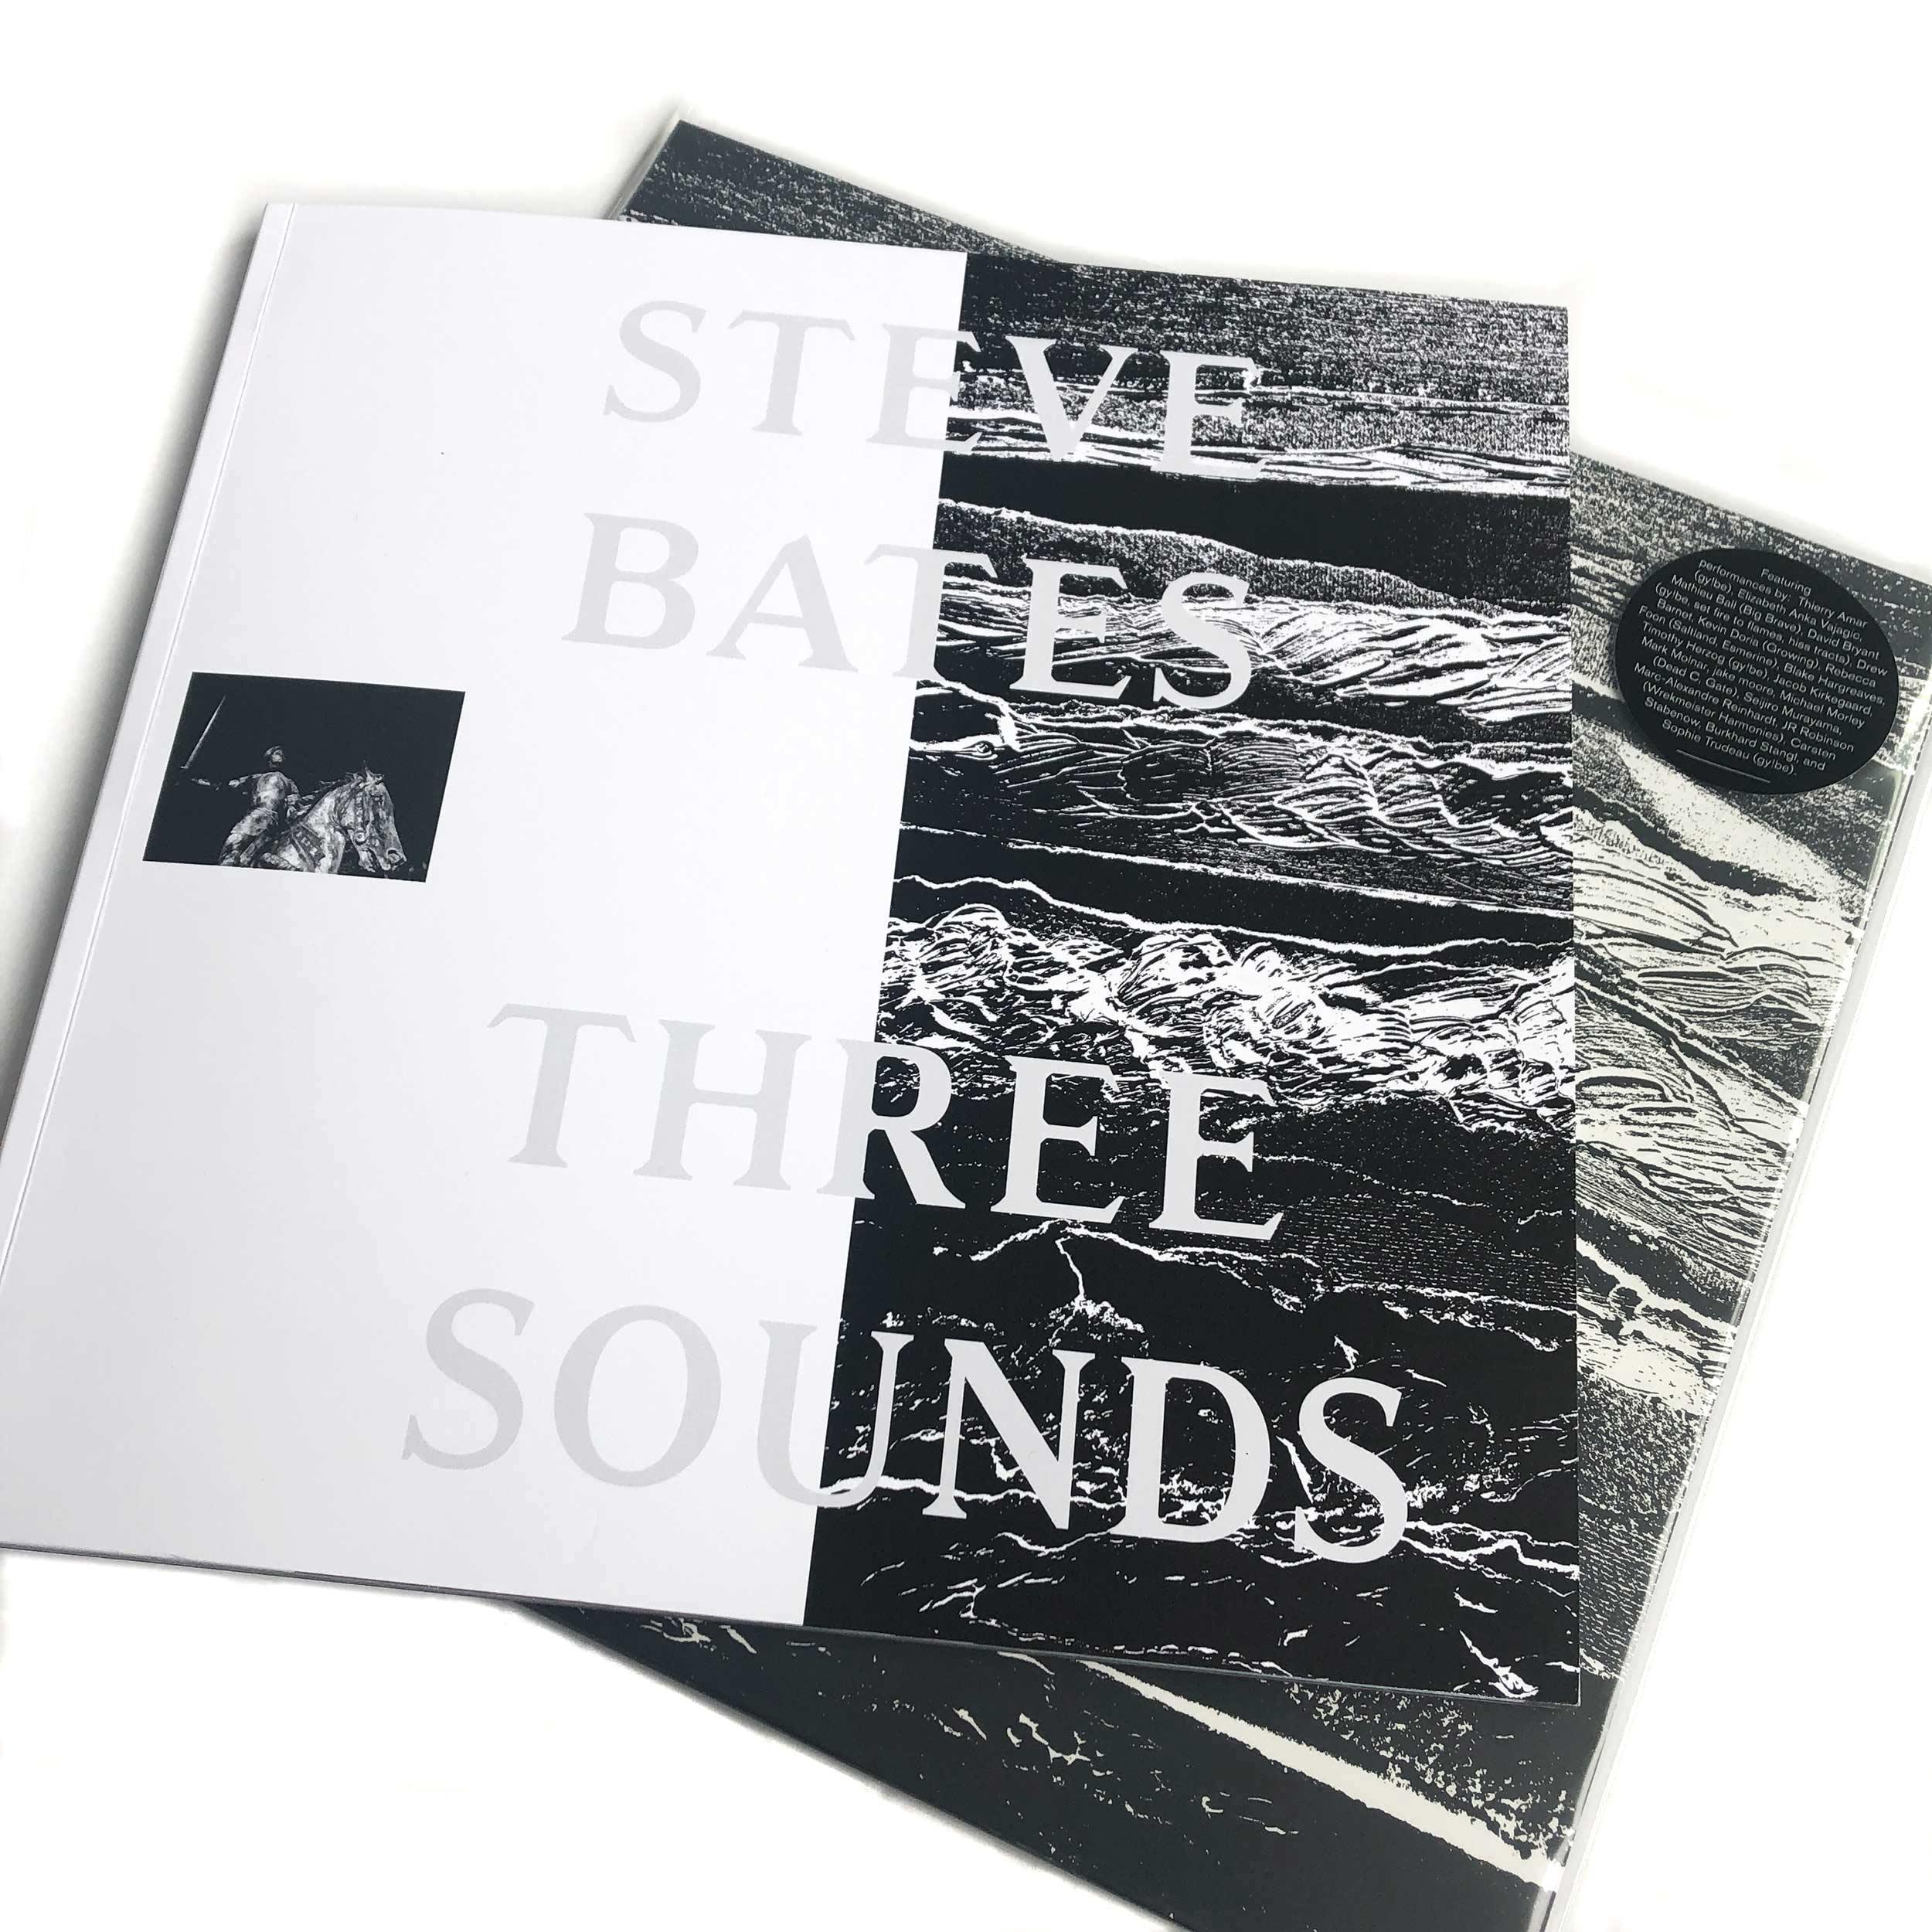 Book-vinyle-cover_web.jpg